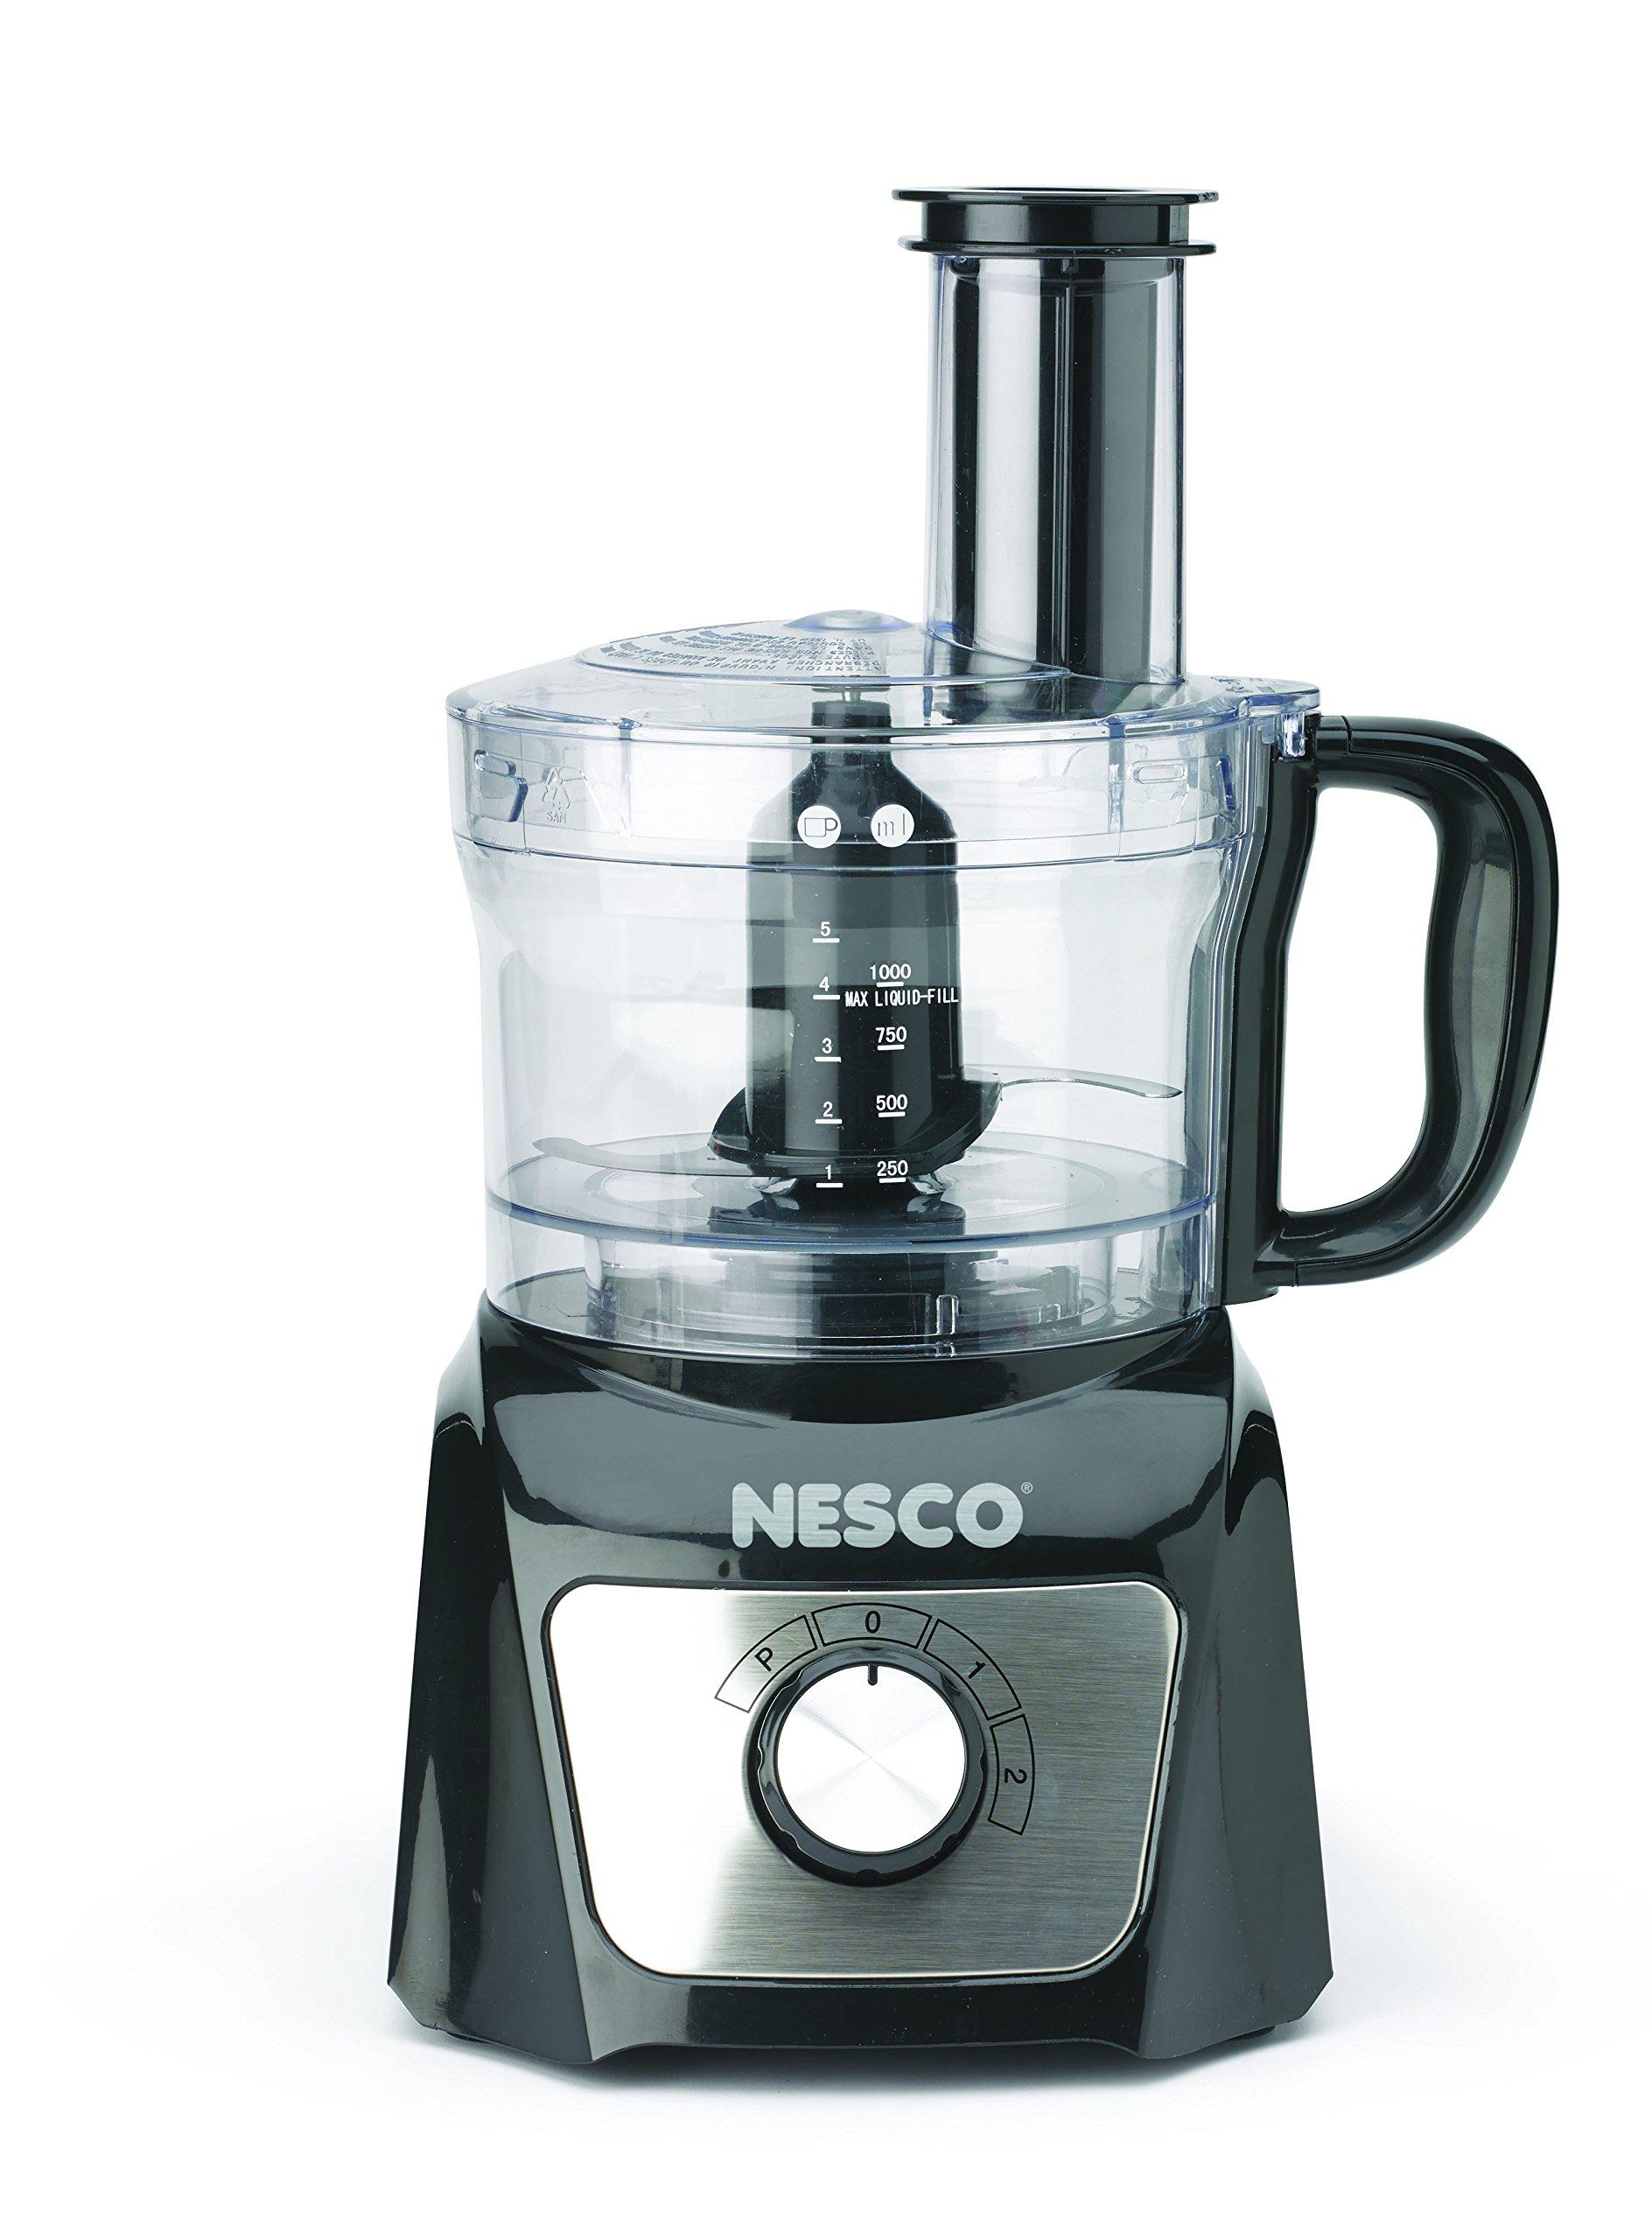 Nesco FP-800 Food Processor, 8-Cup, Black